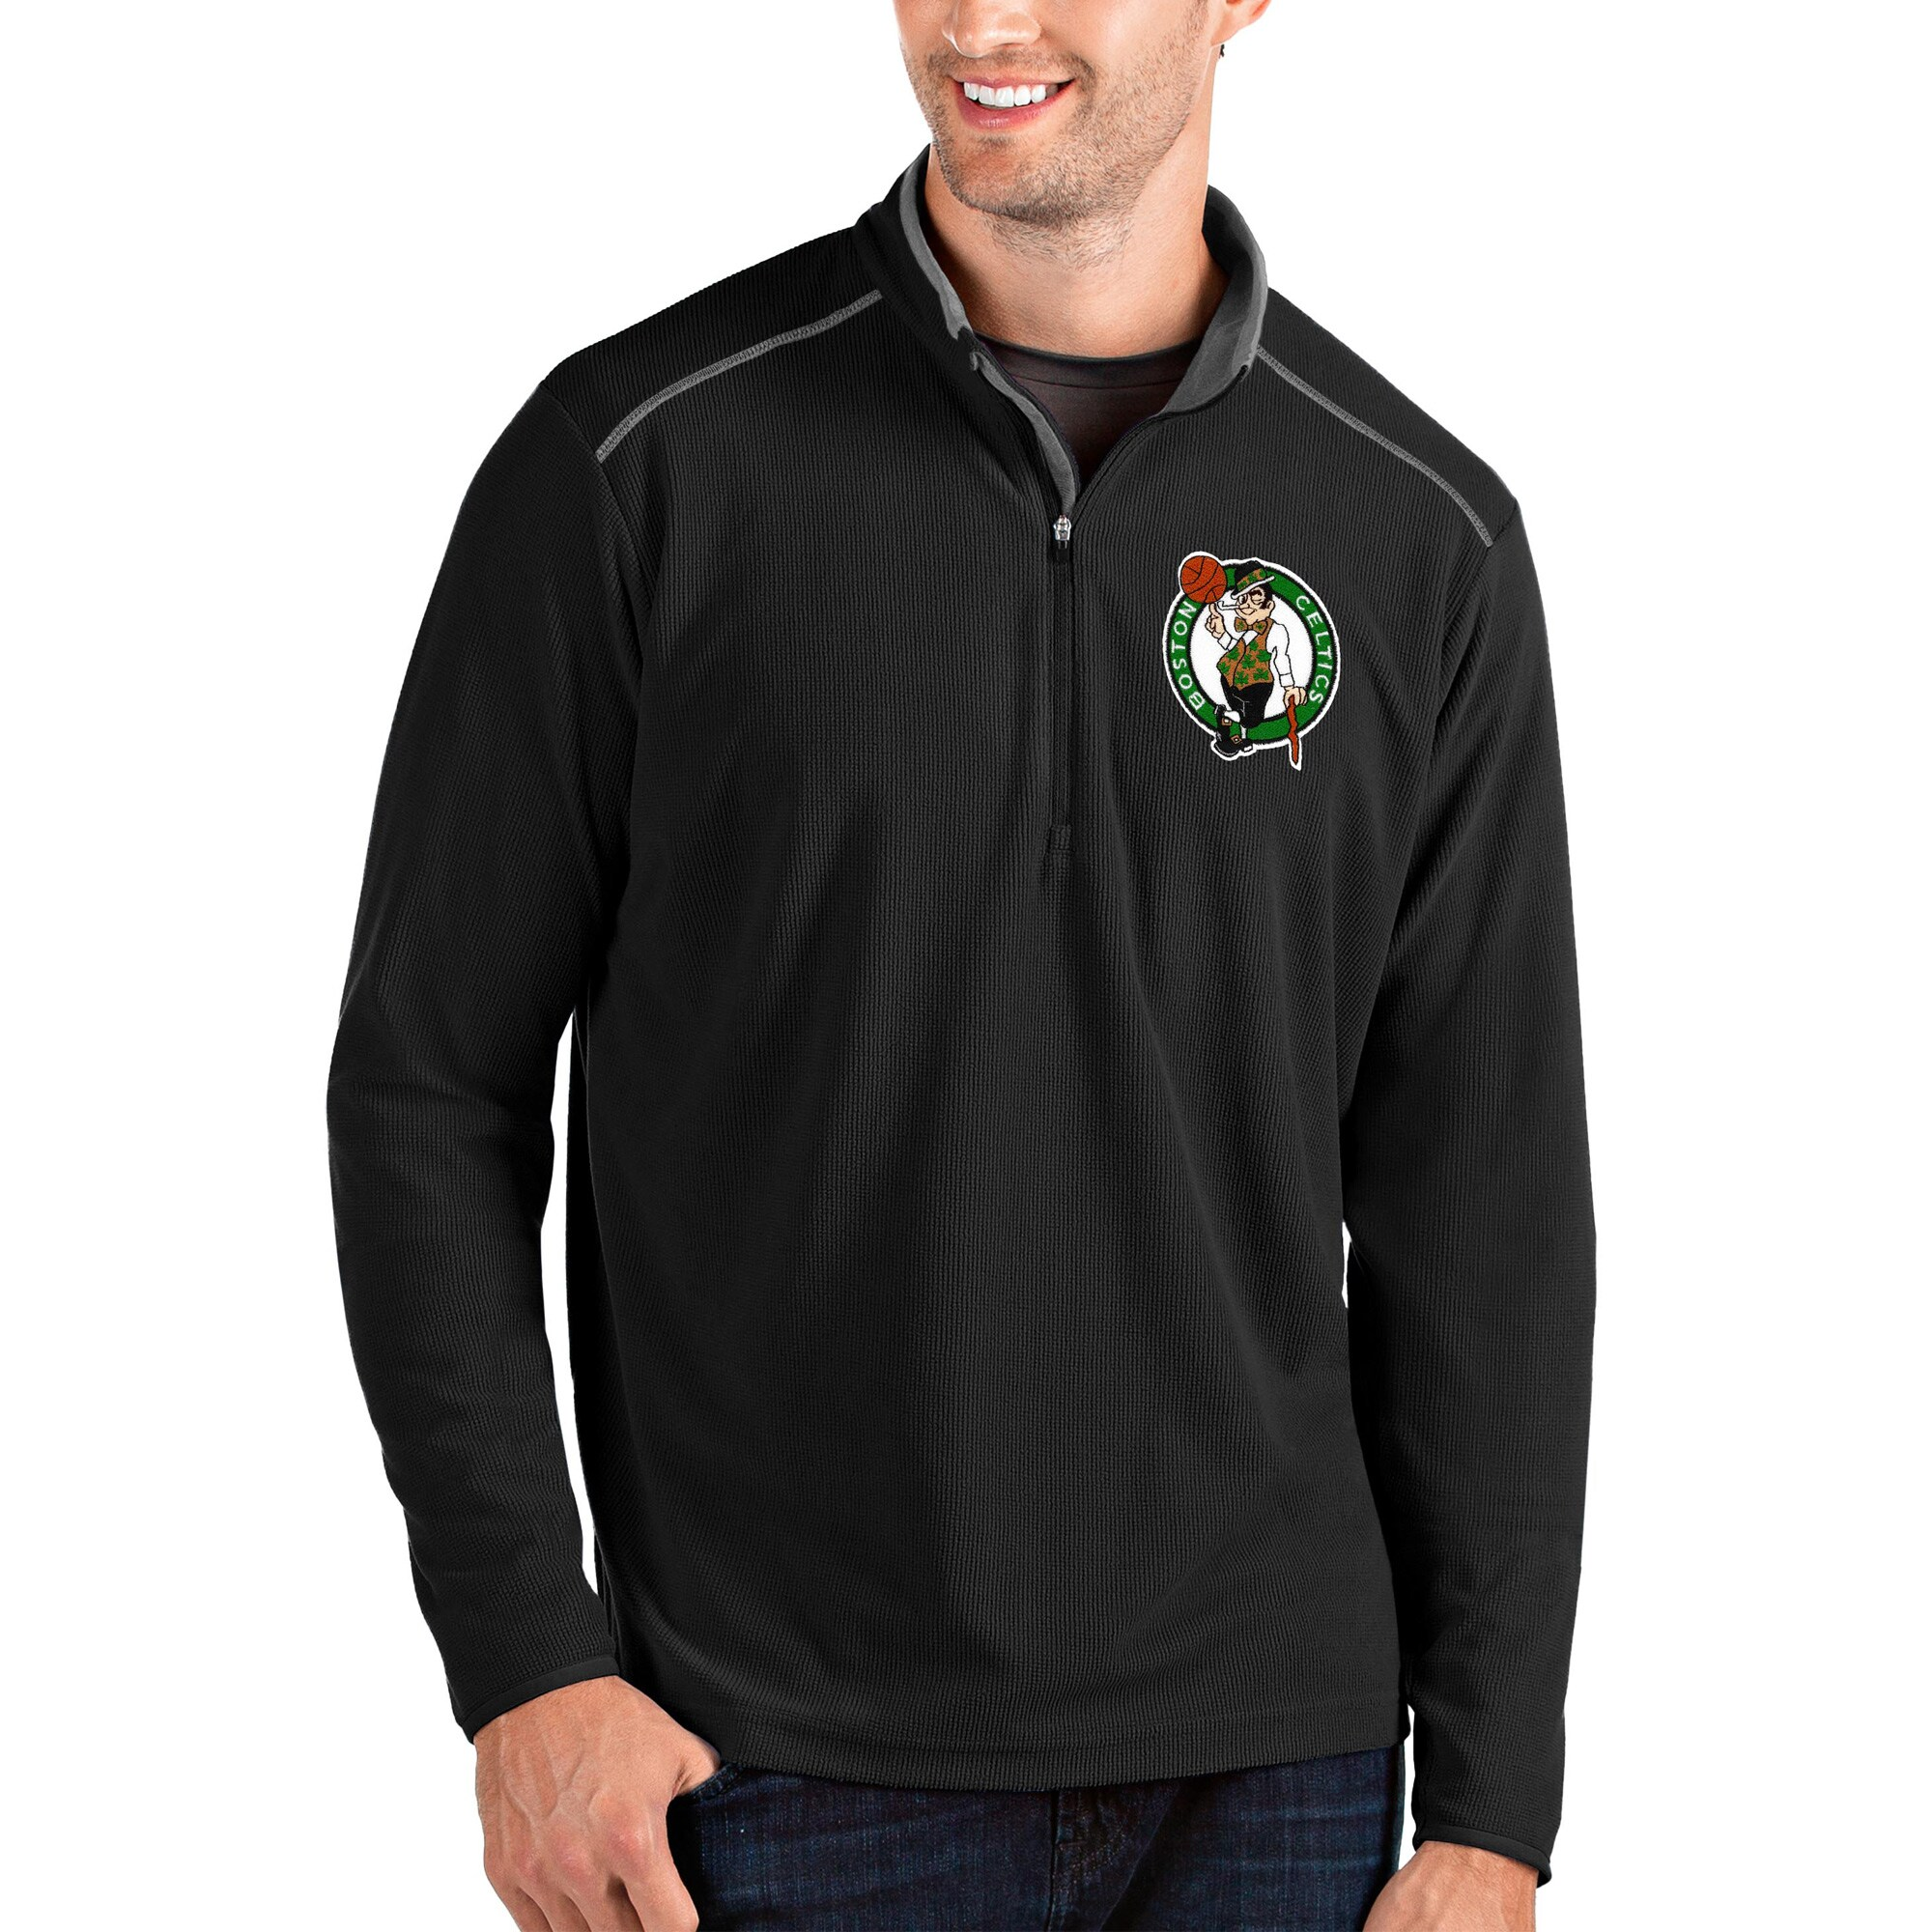 Boston Celtics Antigua Glacier Quarter-Zip Pullover Jacket - Black/Gray